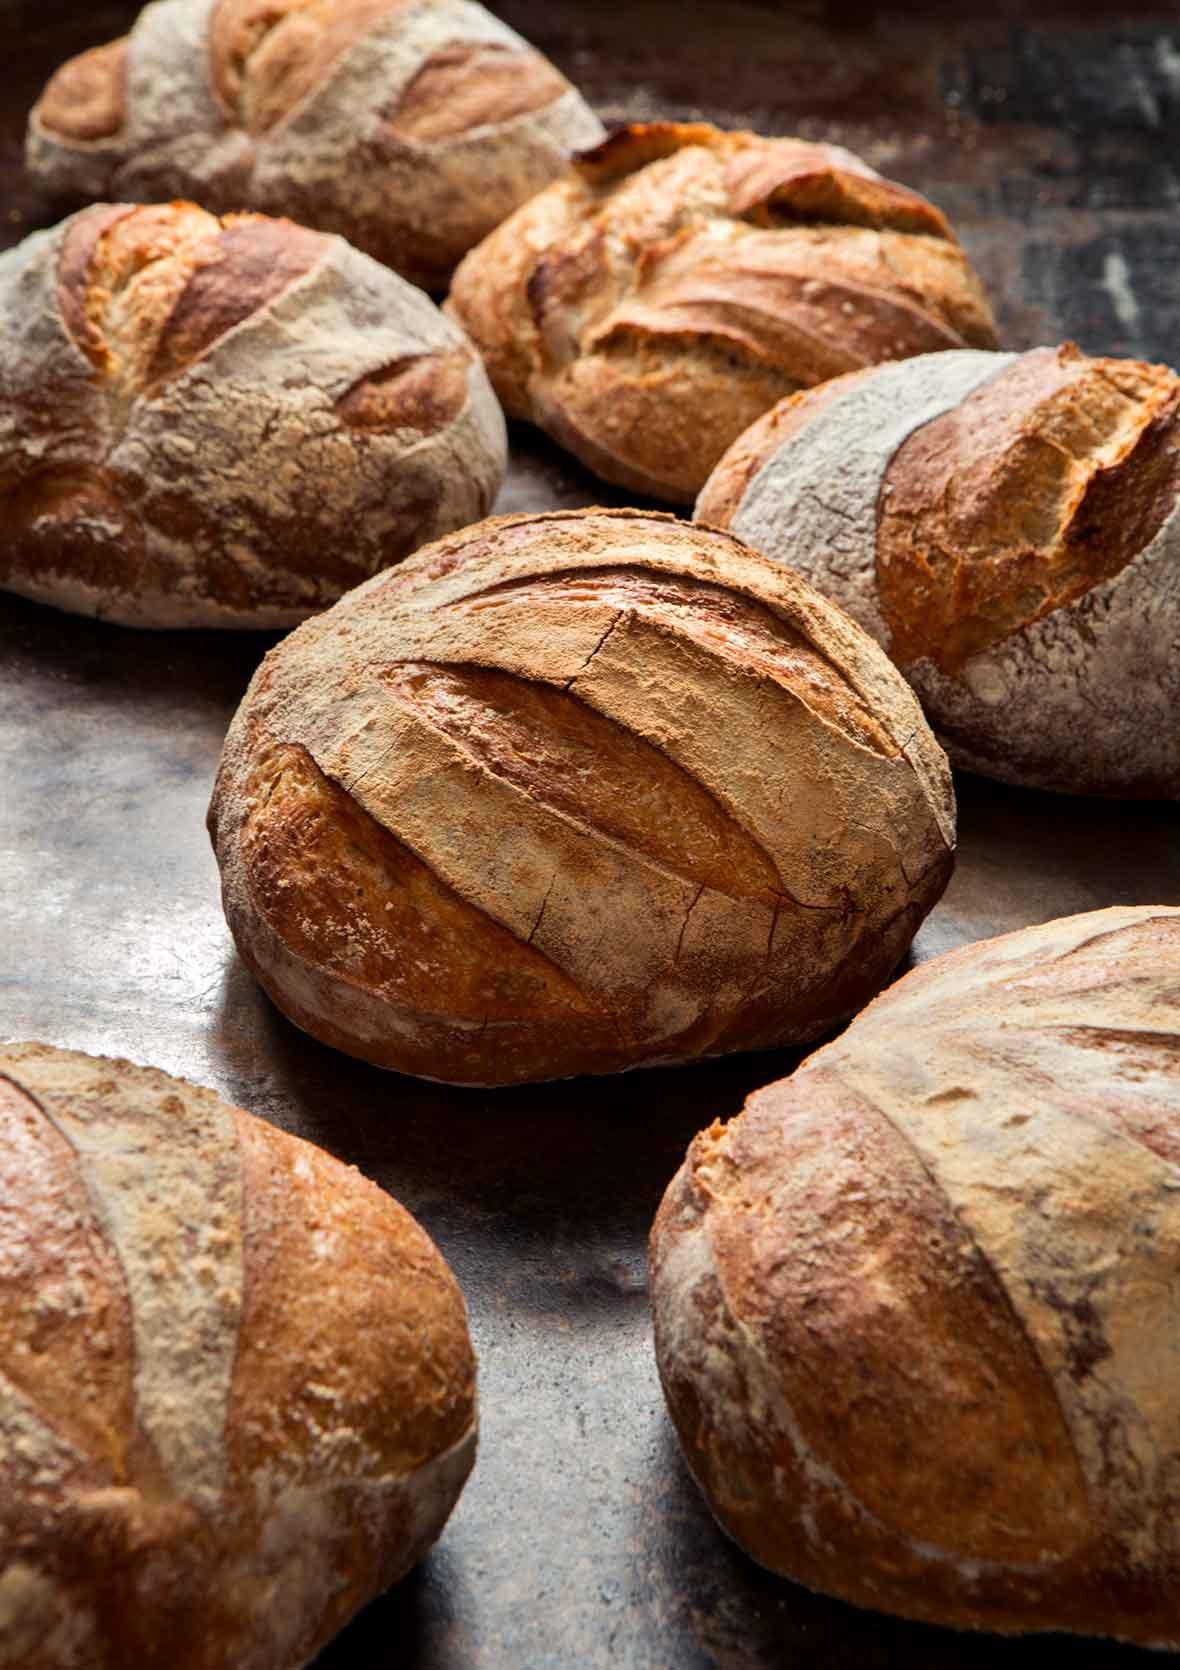 5 Minute Artisan Bread Recipe